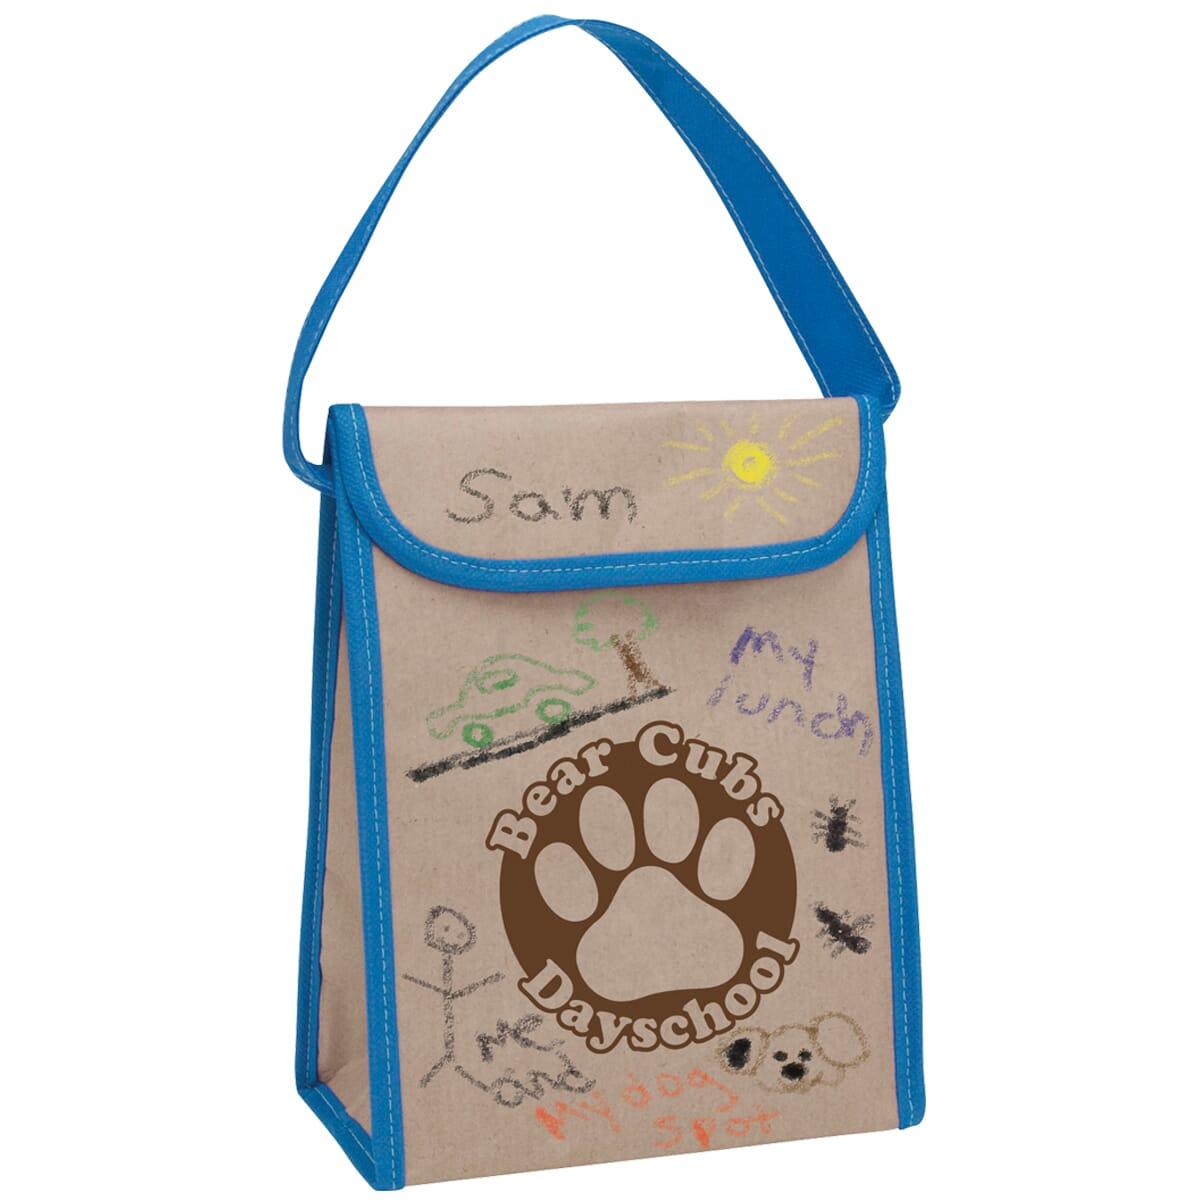 Kraft paper lunch bag